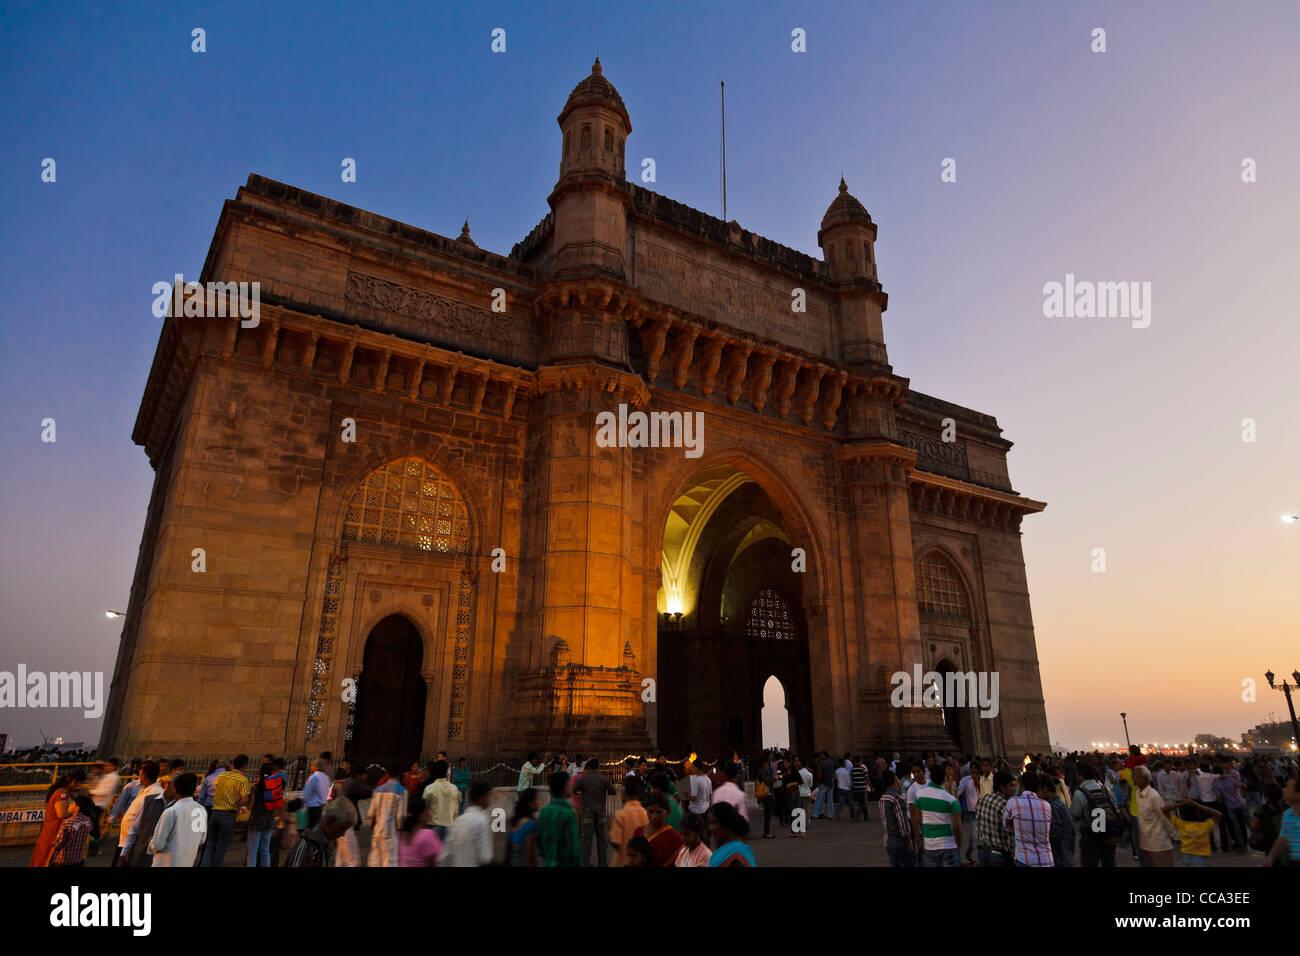 La puerta de la India, Mumbai, Bombay Imagen De Stock